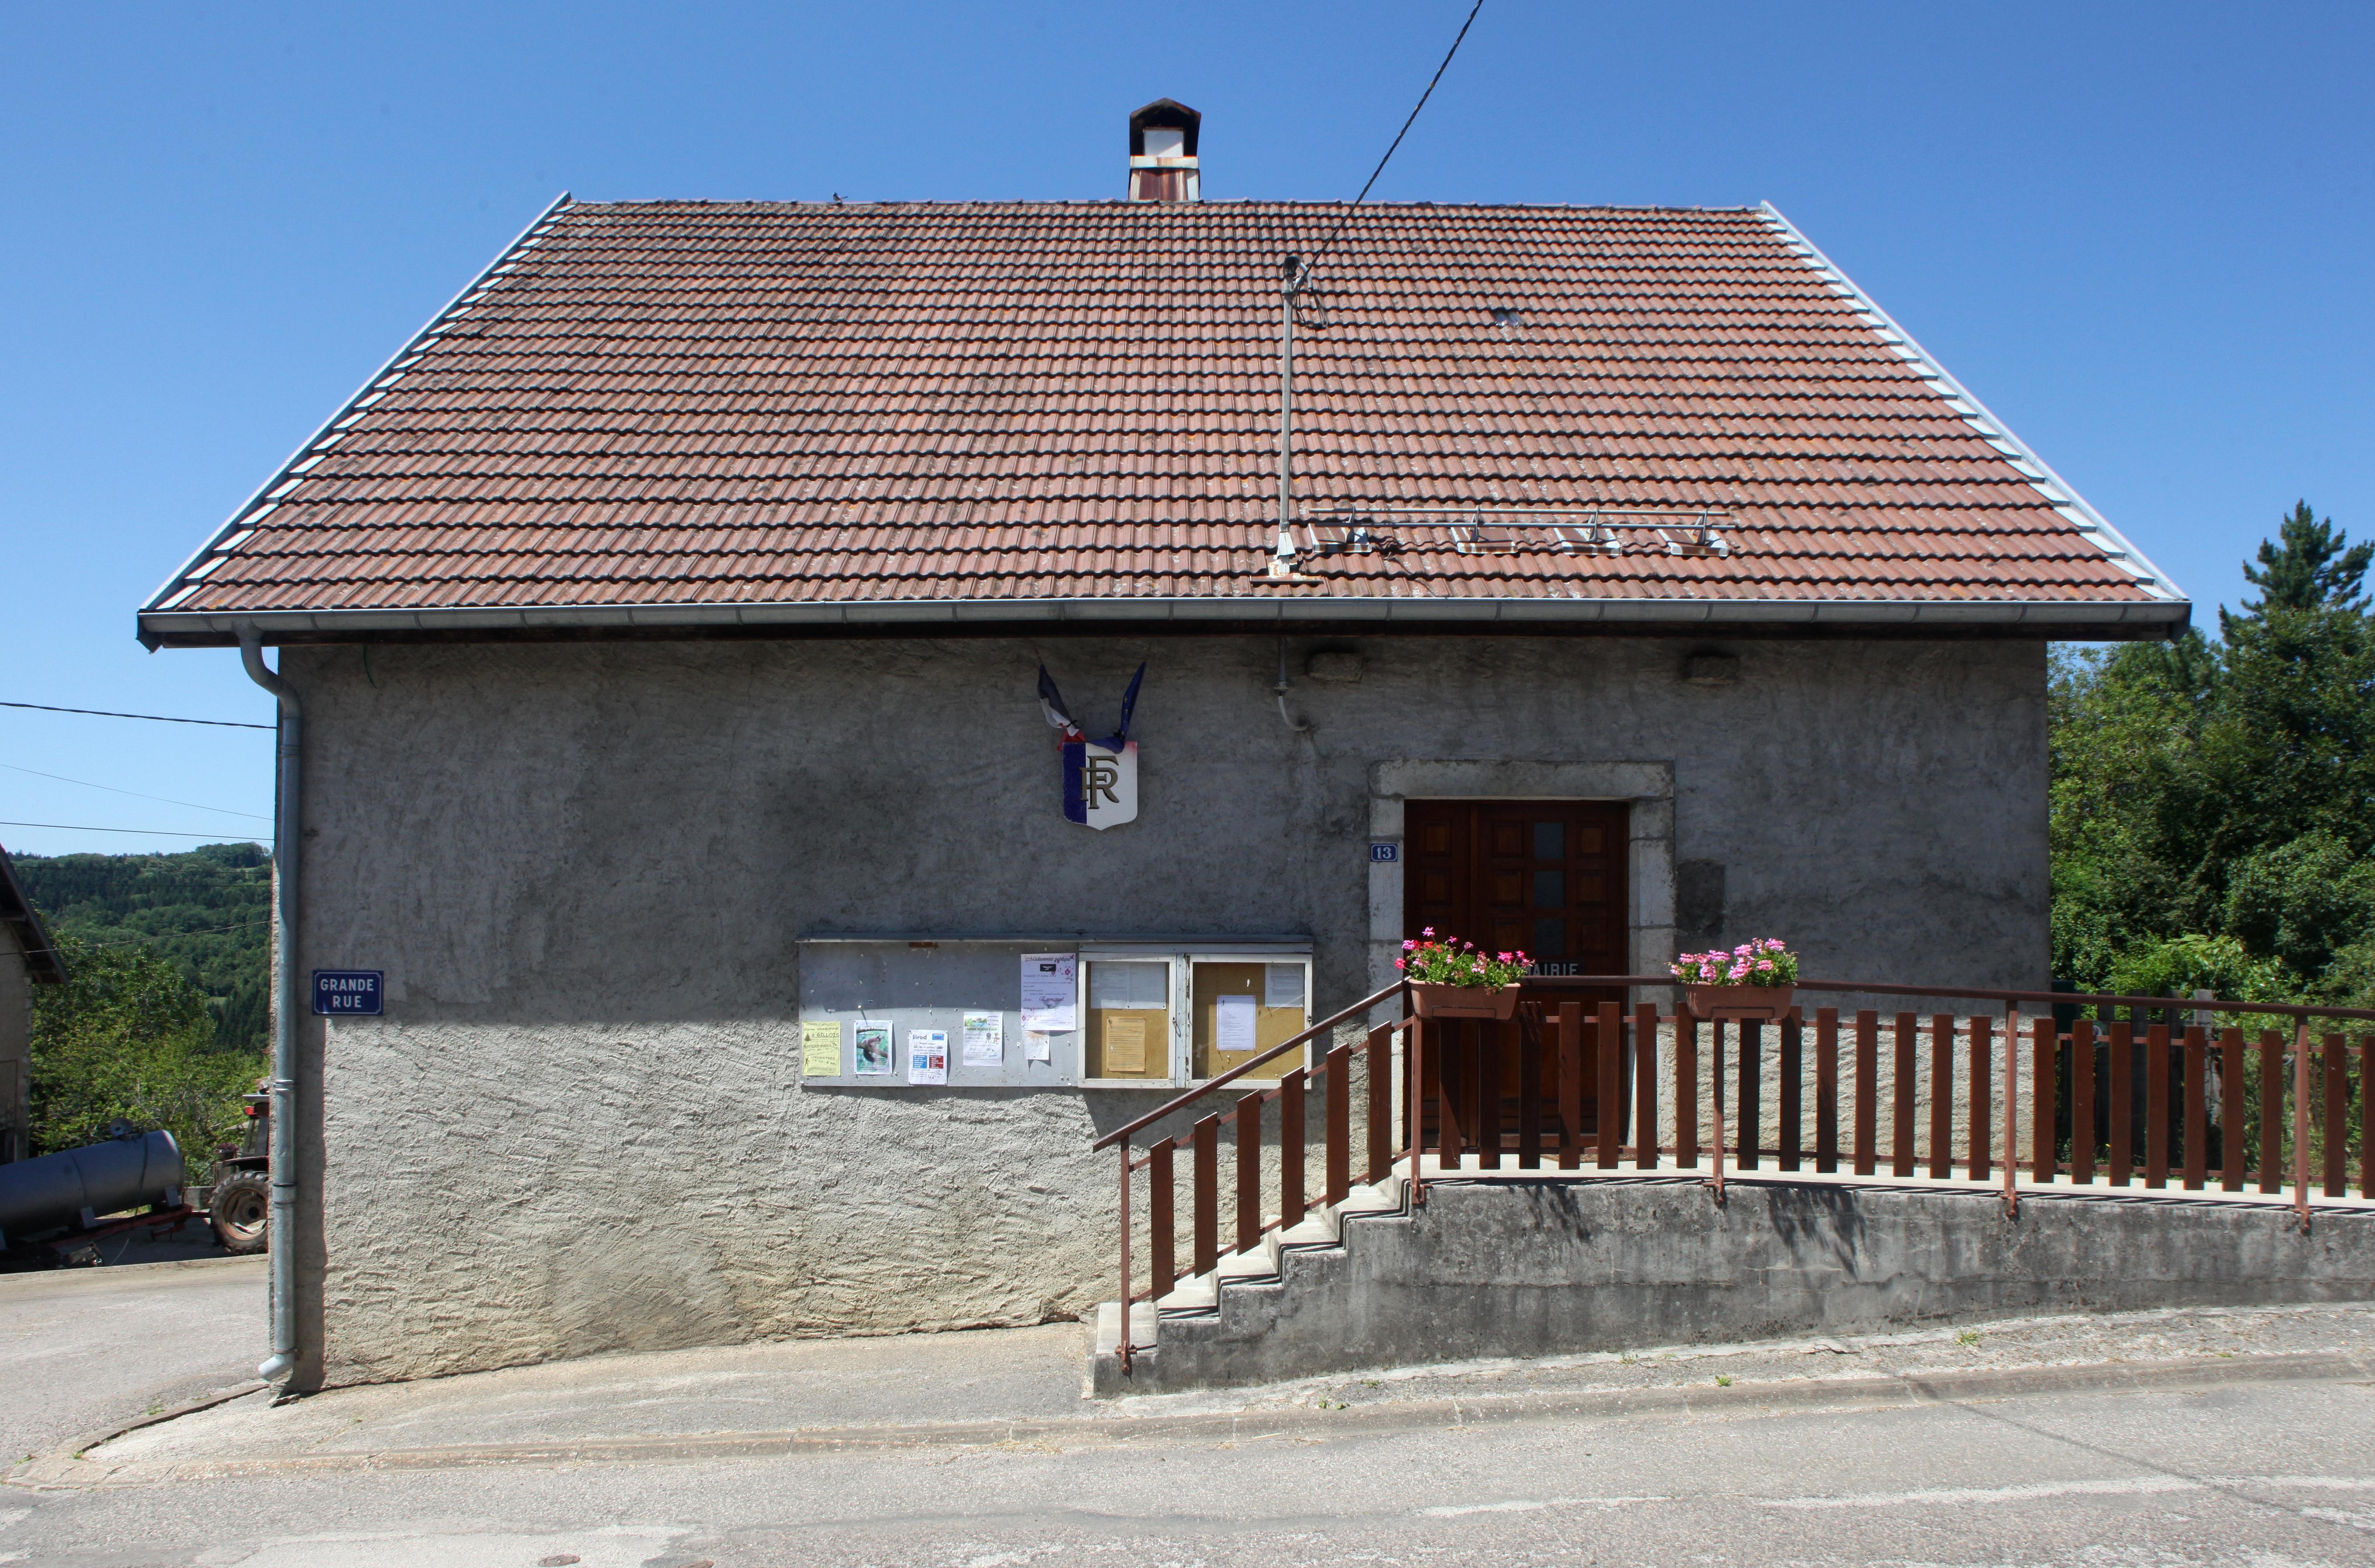 La Maison Du Bois Clairvaux conte, jura - wikipedia